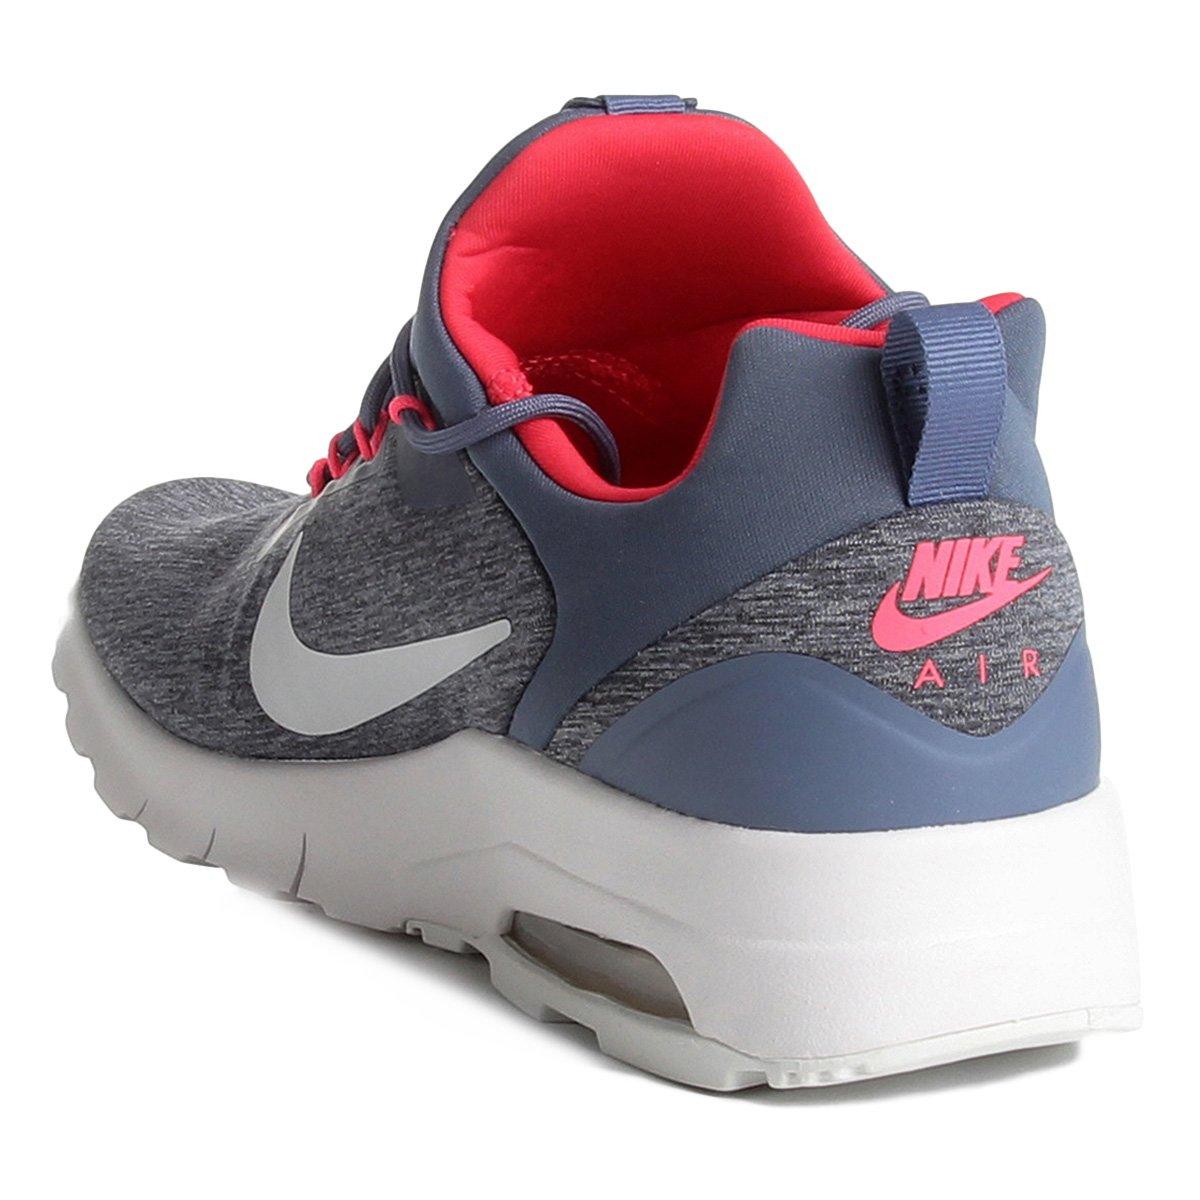 Tênis Nike Wmns Air Max Motion Racer Feminino - Compre Agora  32b09332ae0f4